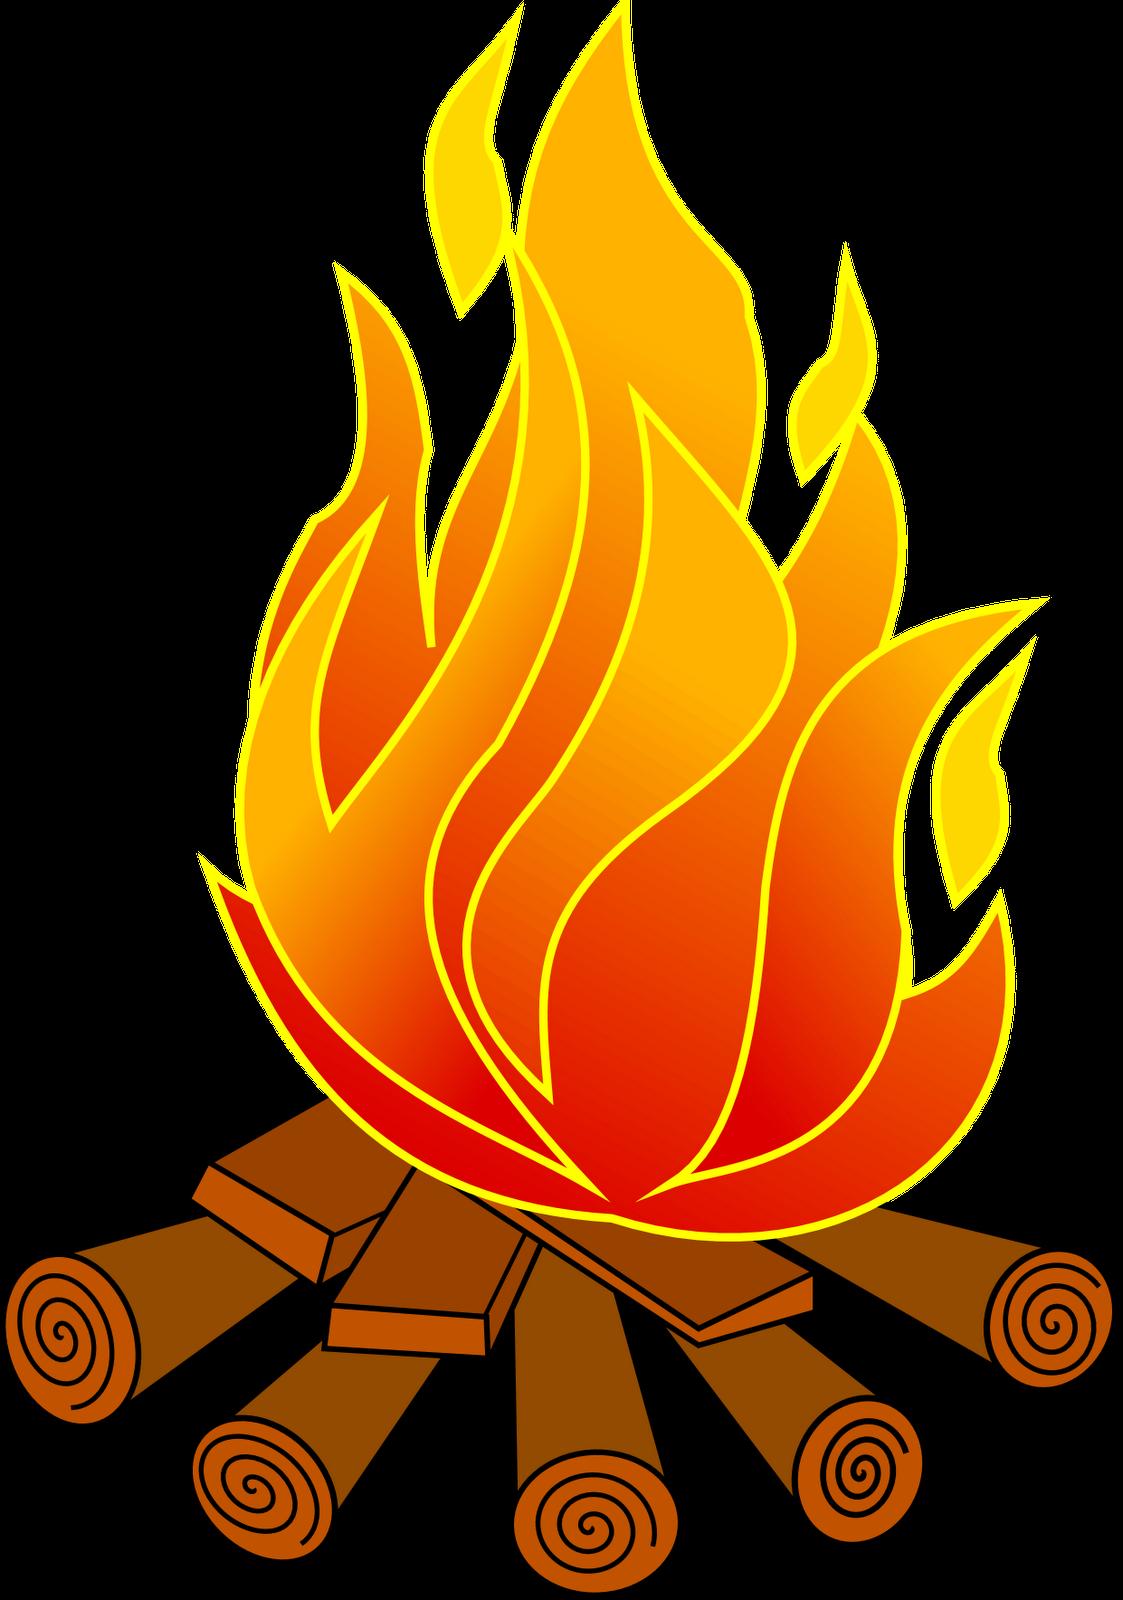 Fire clip art school famclipart 2